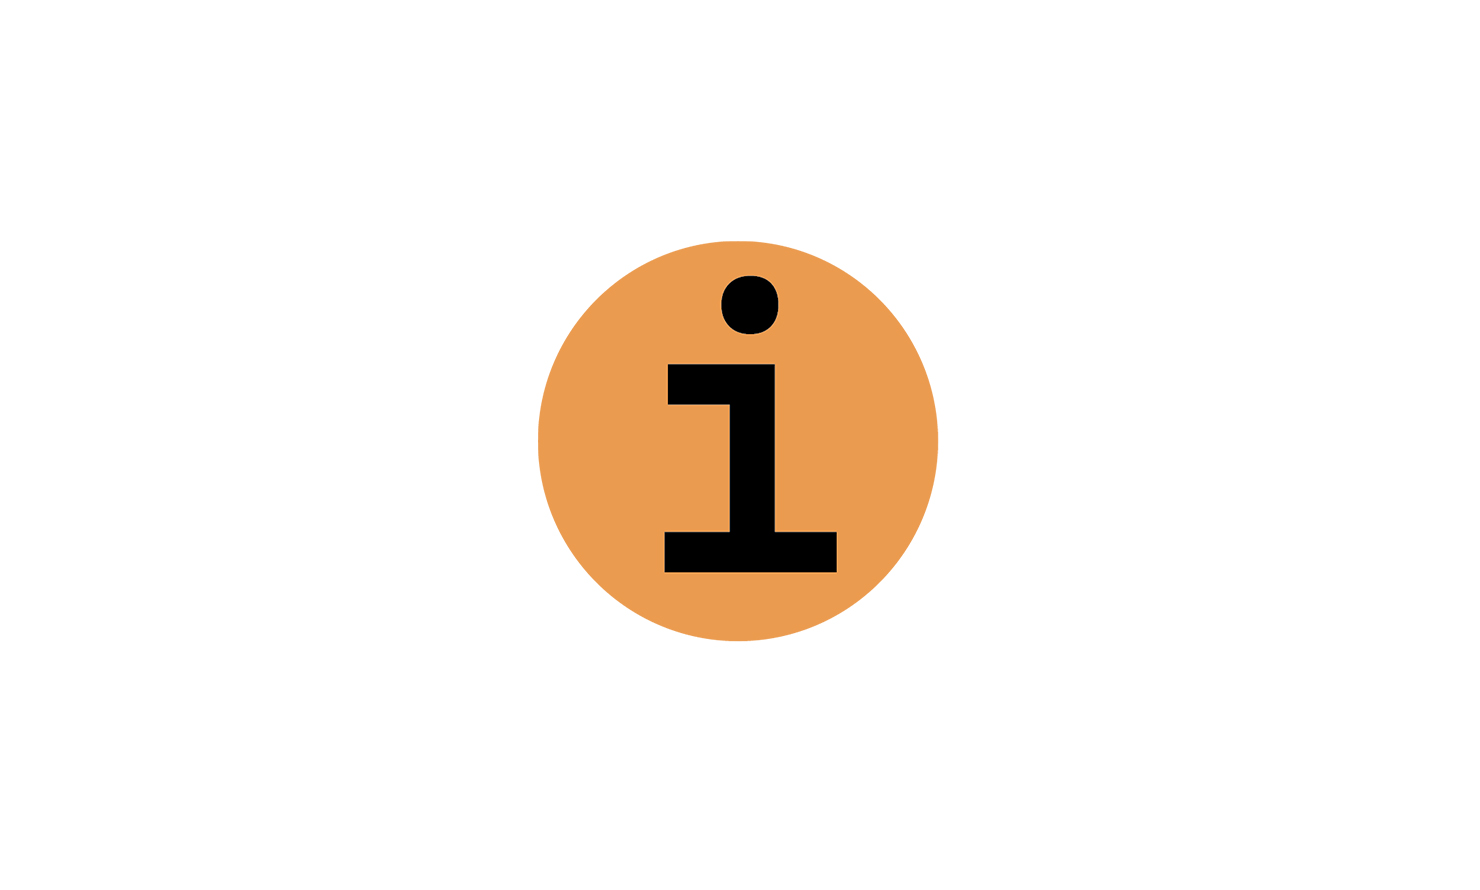 https://www.kubelibre.com/uploads/Slider-work-tutti-clienti/ivrea-e-unesco-città-industriale-del-xx-secolo-logo.jpg